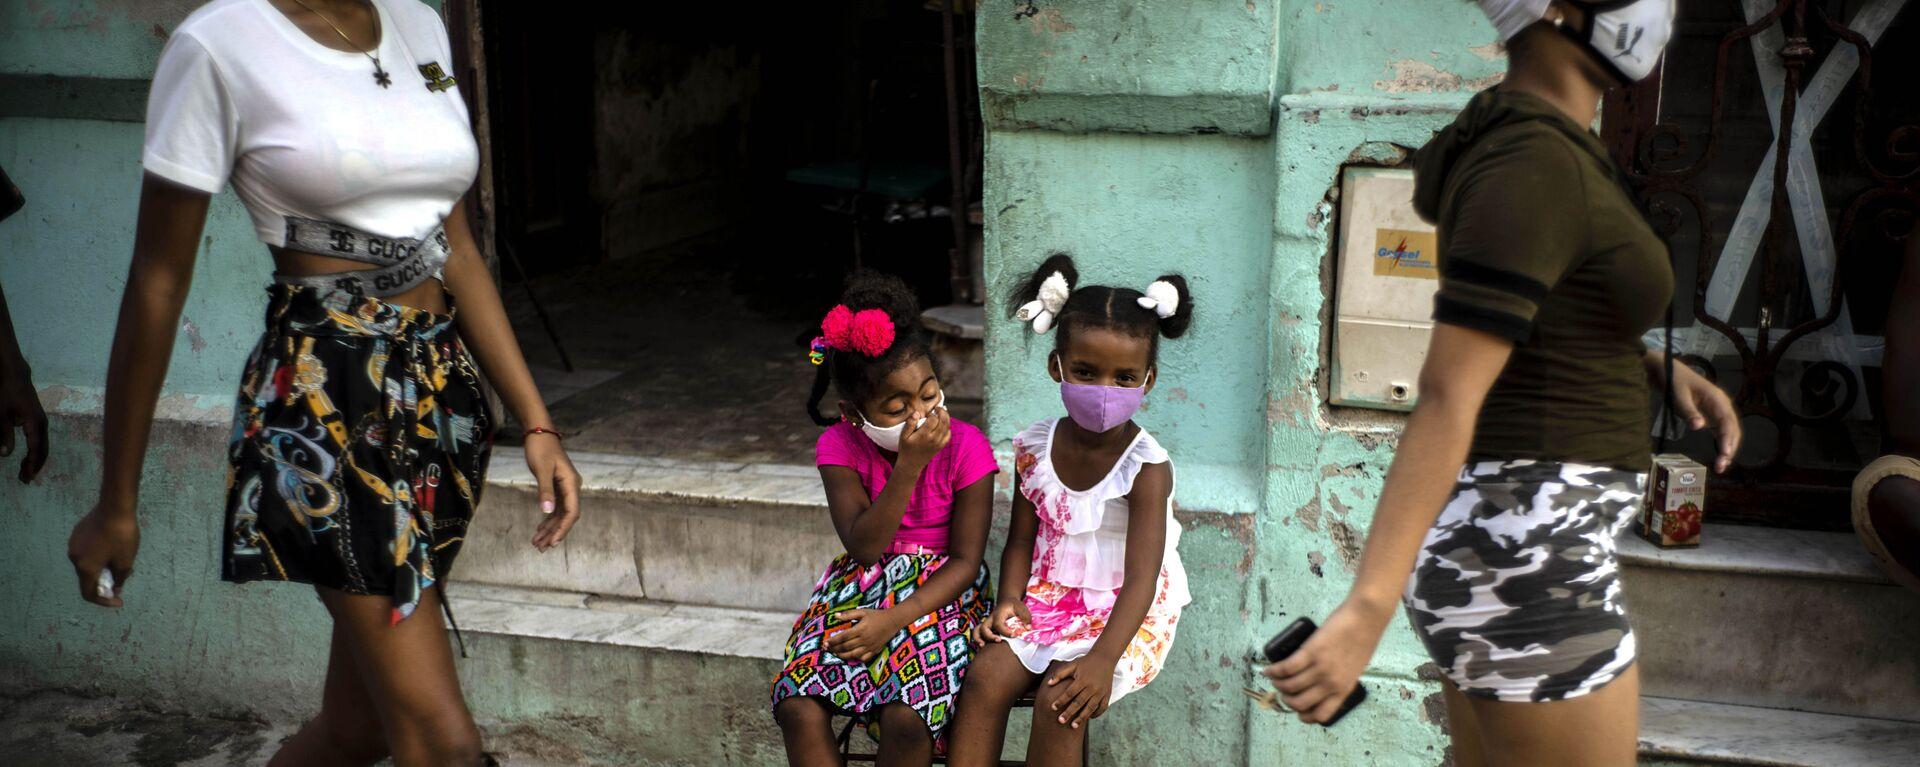 Девочки в масках ждут своих родителей, сидя на стуле в Гаване, Куба - Sputnik Italia, 1920, 12.07.2021